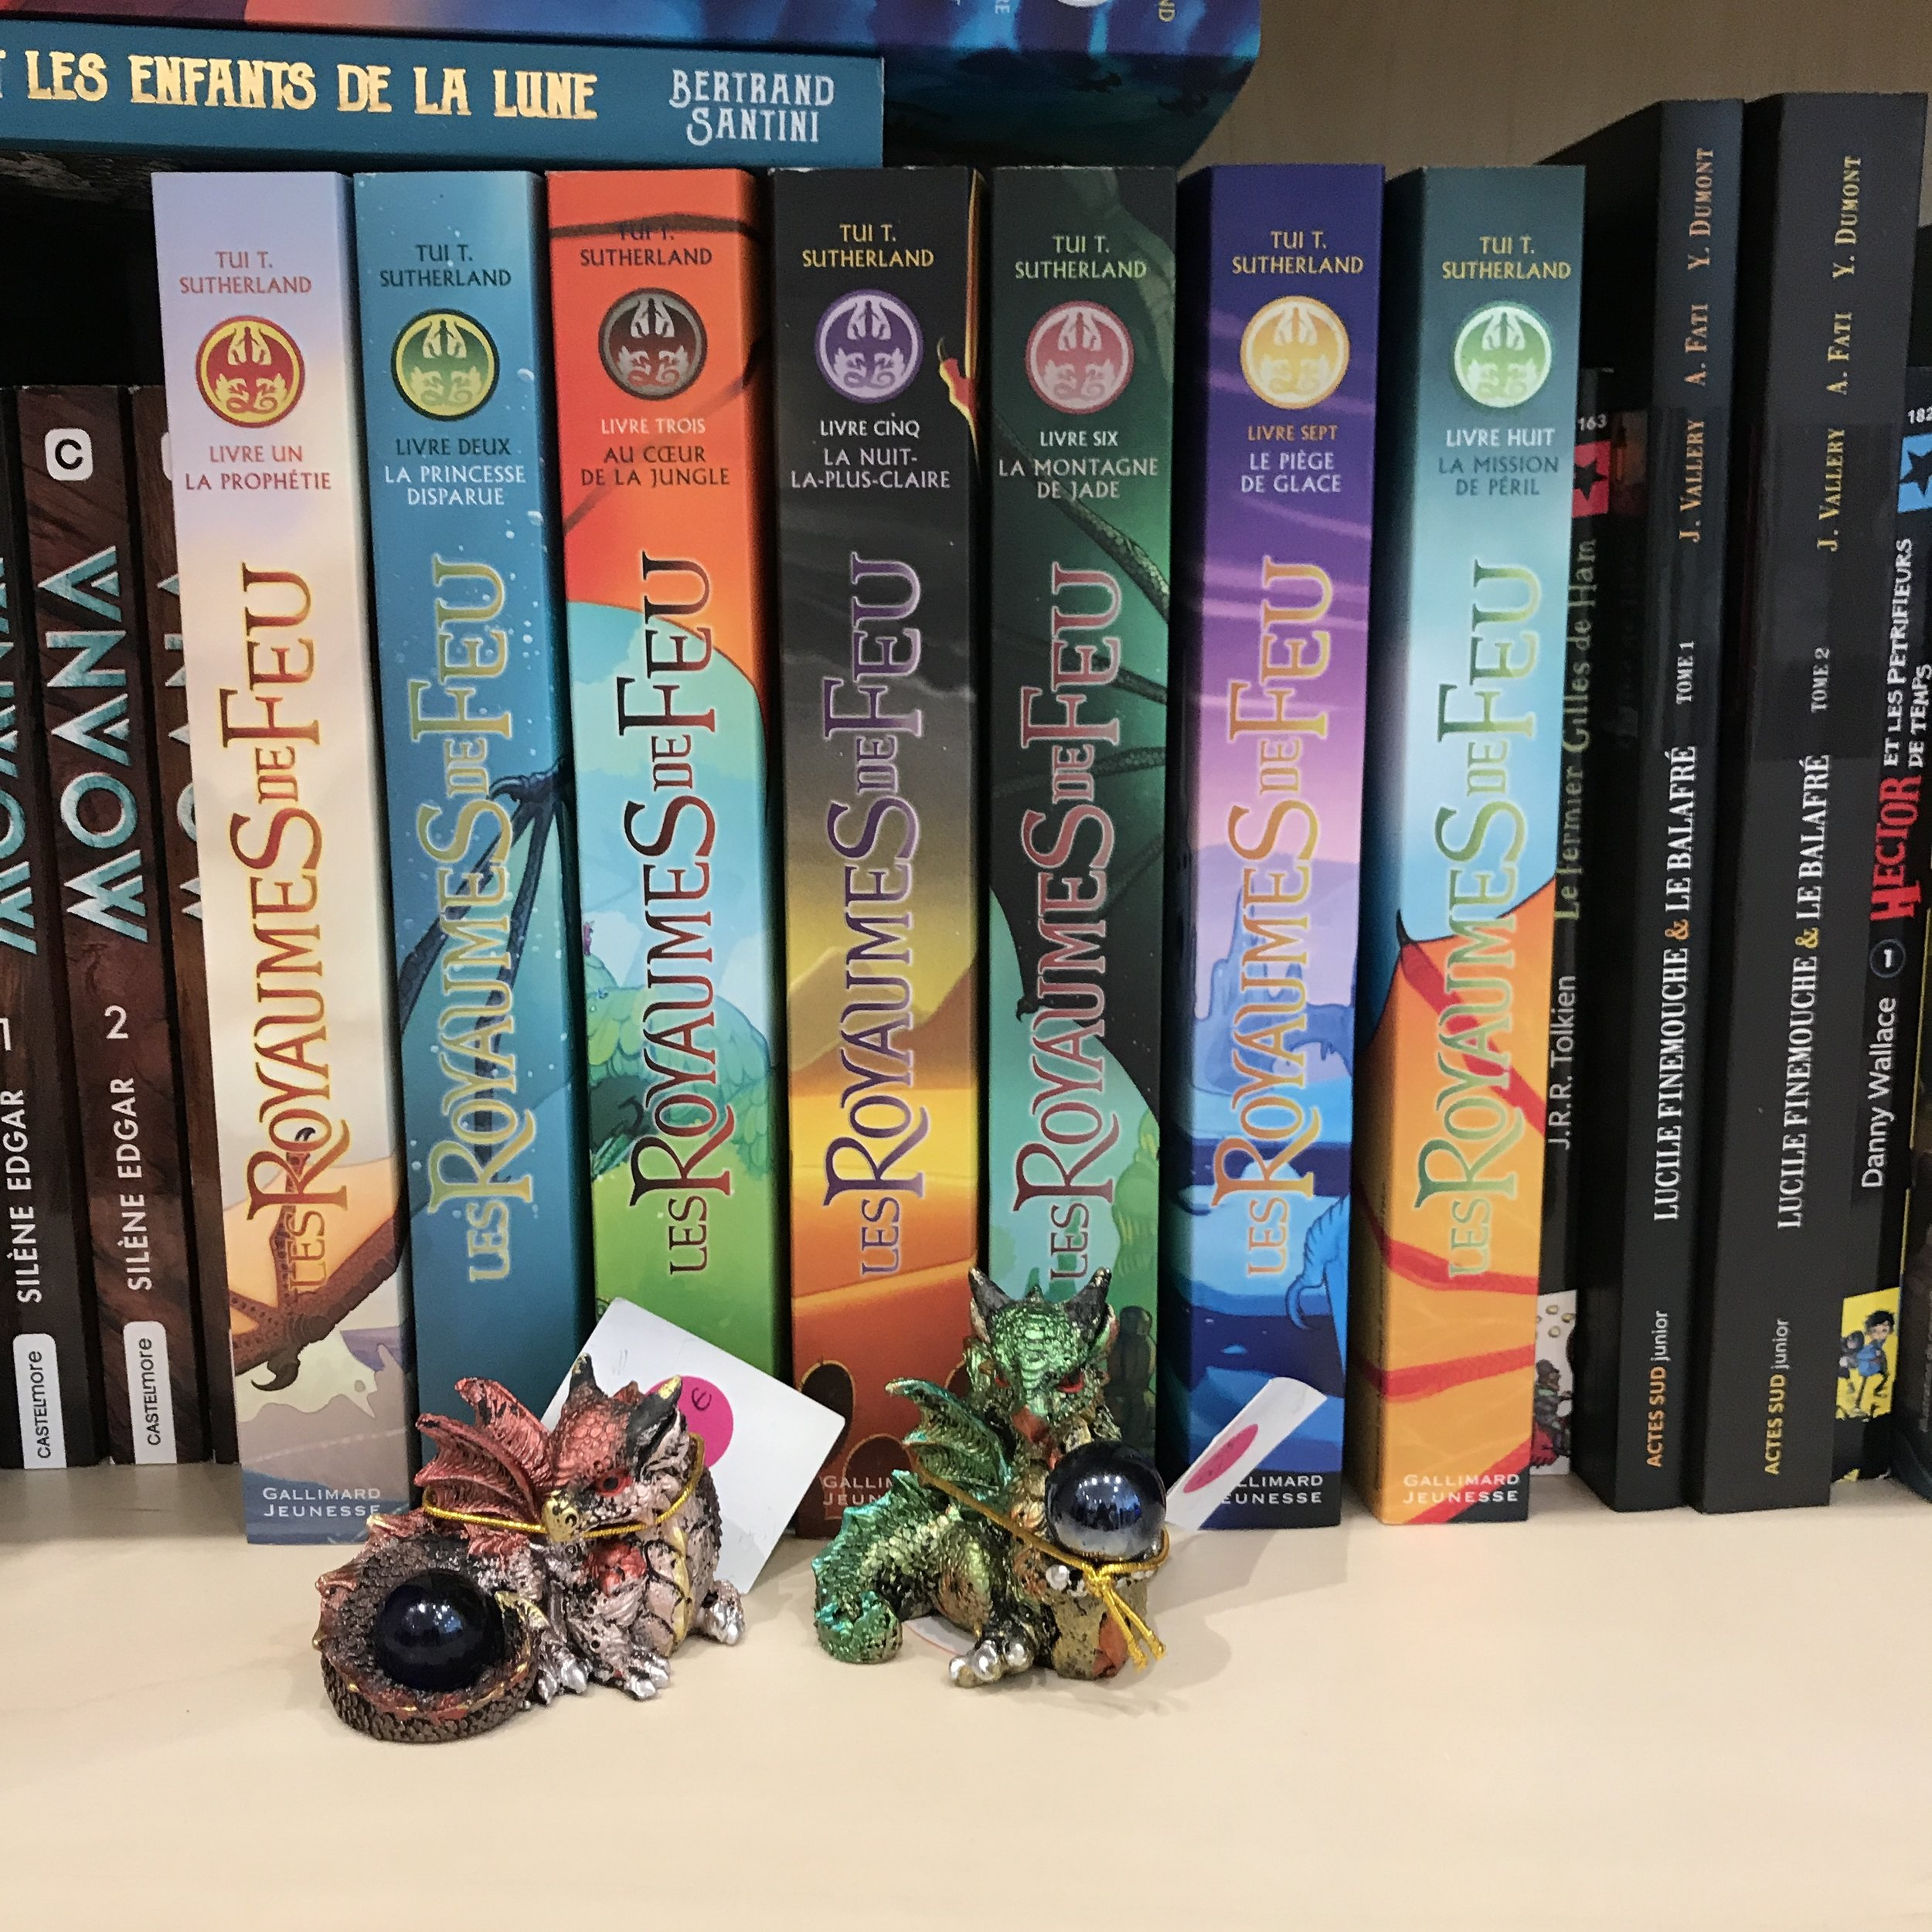 Le Nuage Vert Dragons Dr Bookworm.JPG